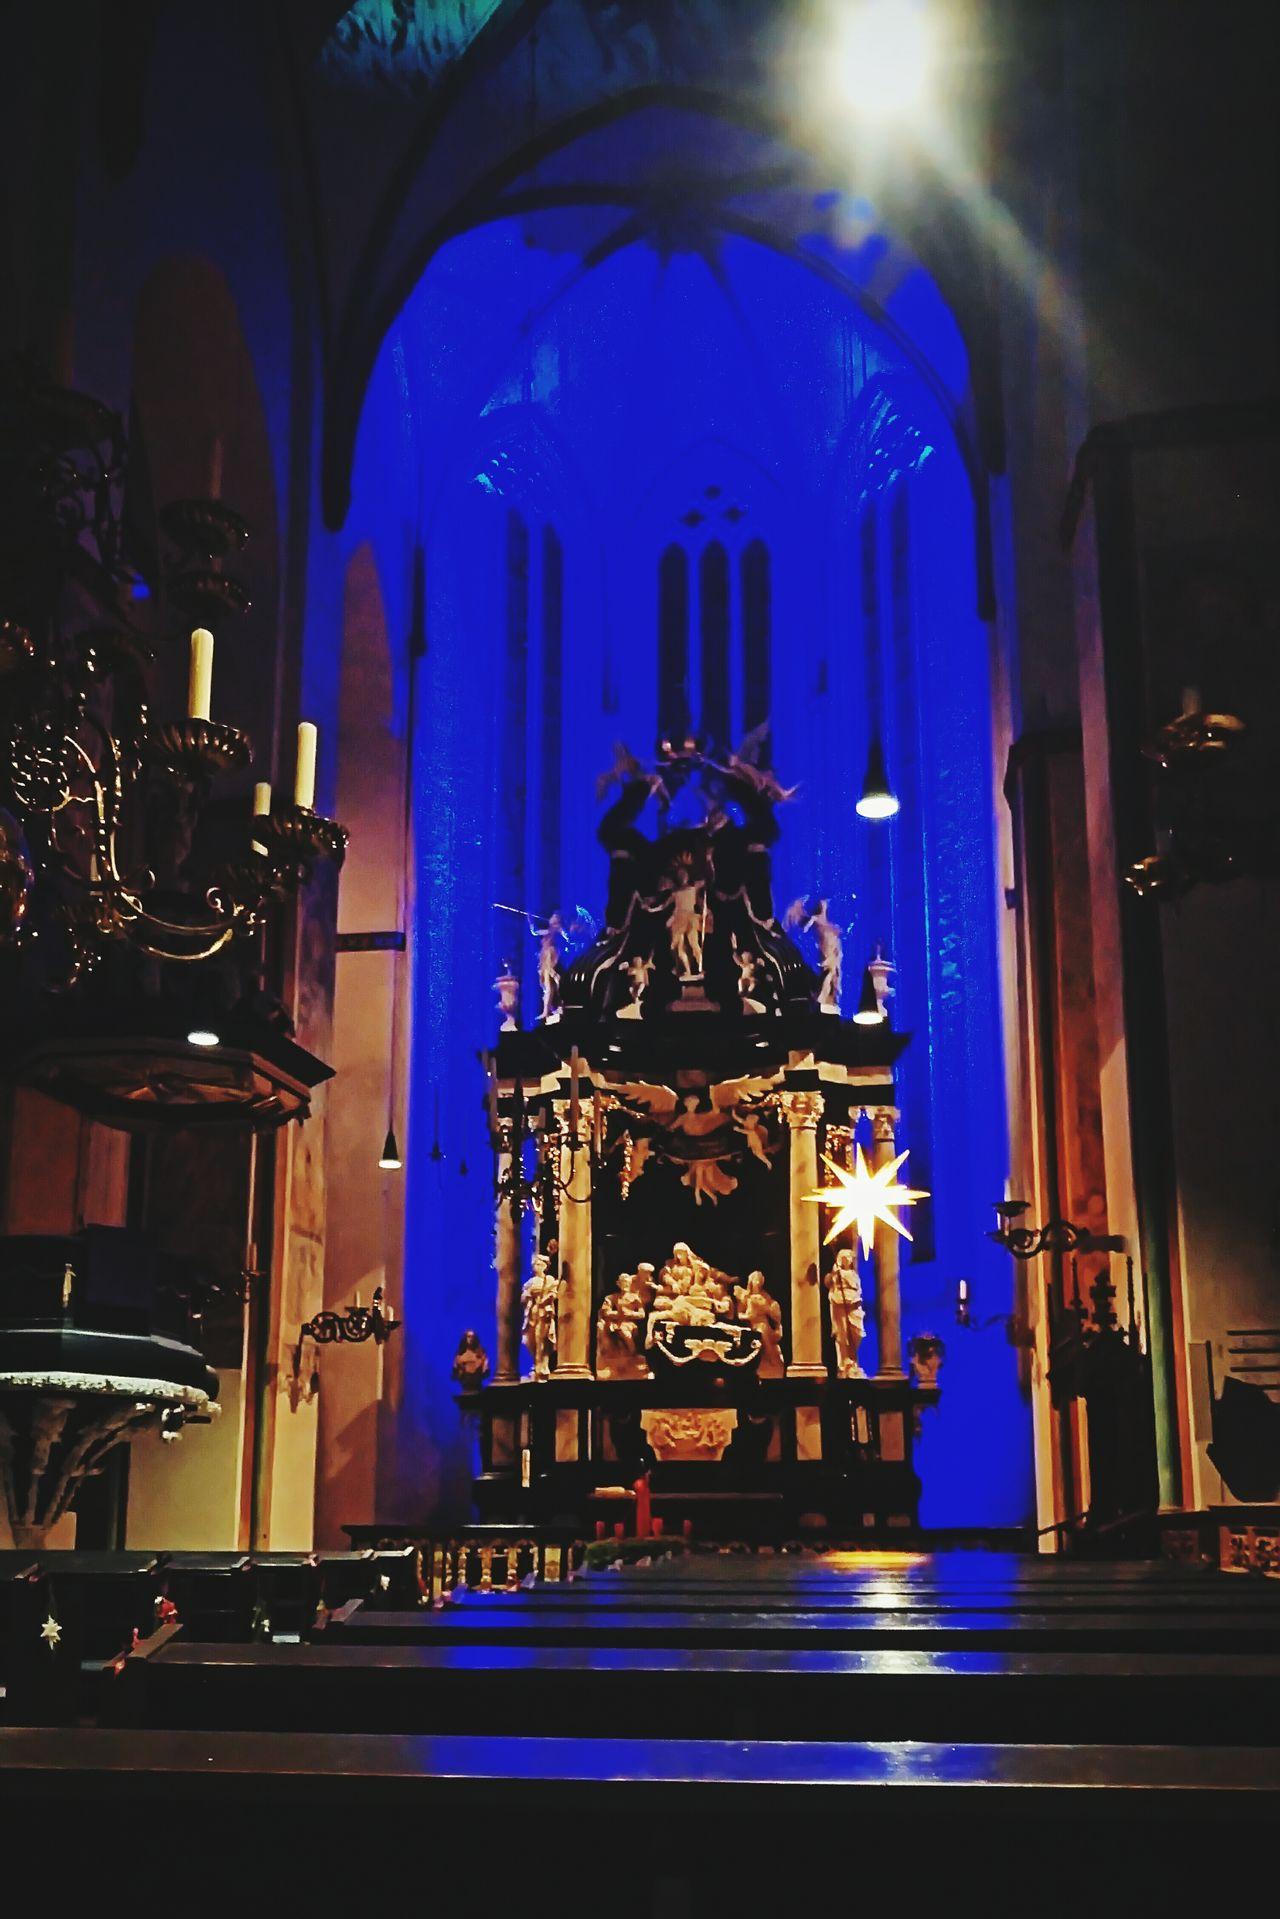 When religion meets visuals - Church European  Art Architecture Night Bluelight Lighting Modern Churchporn Religion Visuals